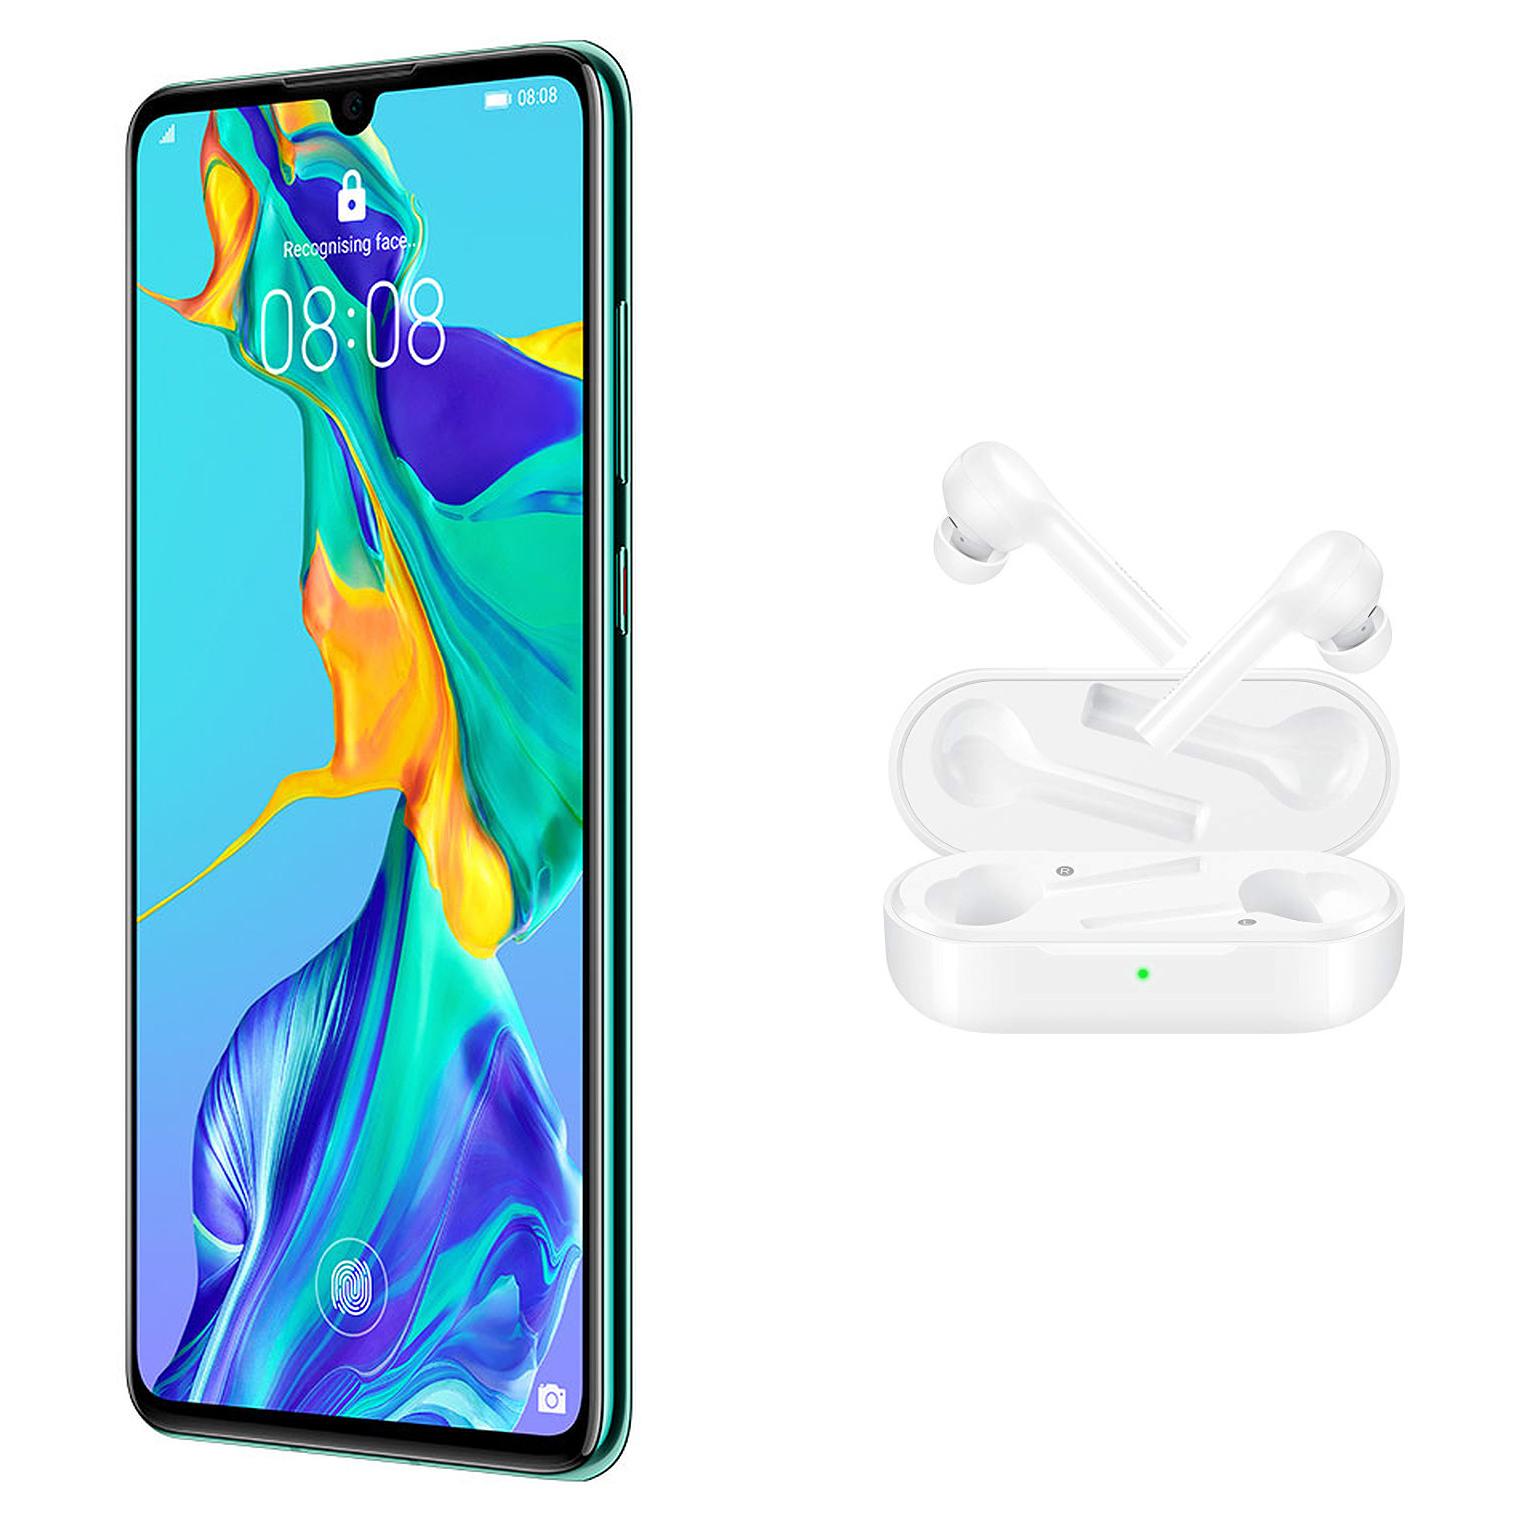 10% en SuperPoints sur Boulanger - Ex : Smartphone Huawei P30 Bleu + FreeBuds Lite (via formulaire) - 469€ avec RAKUTEN30 + 46.90€ en SP